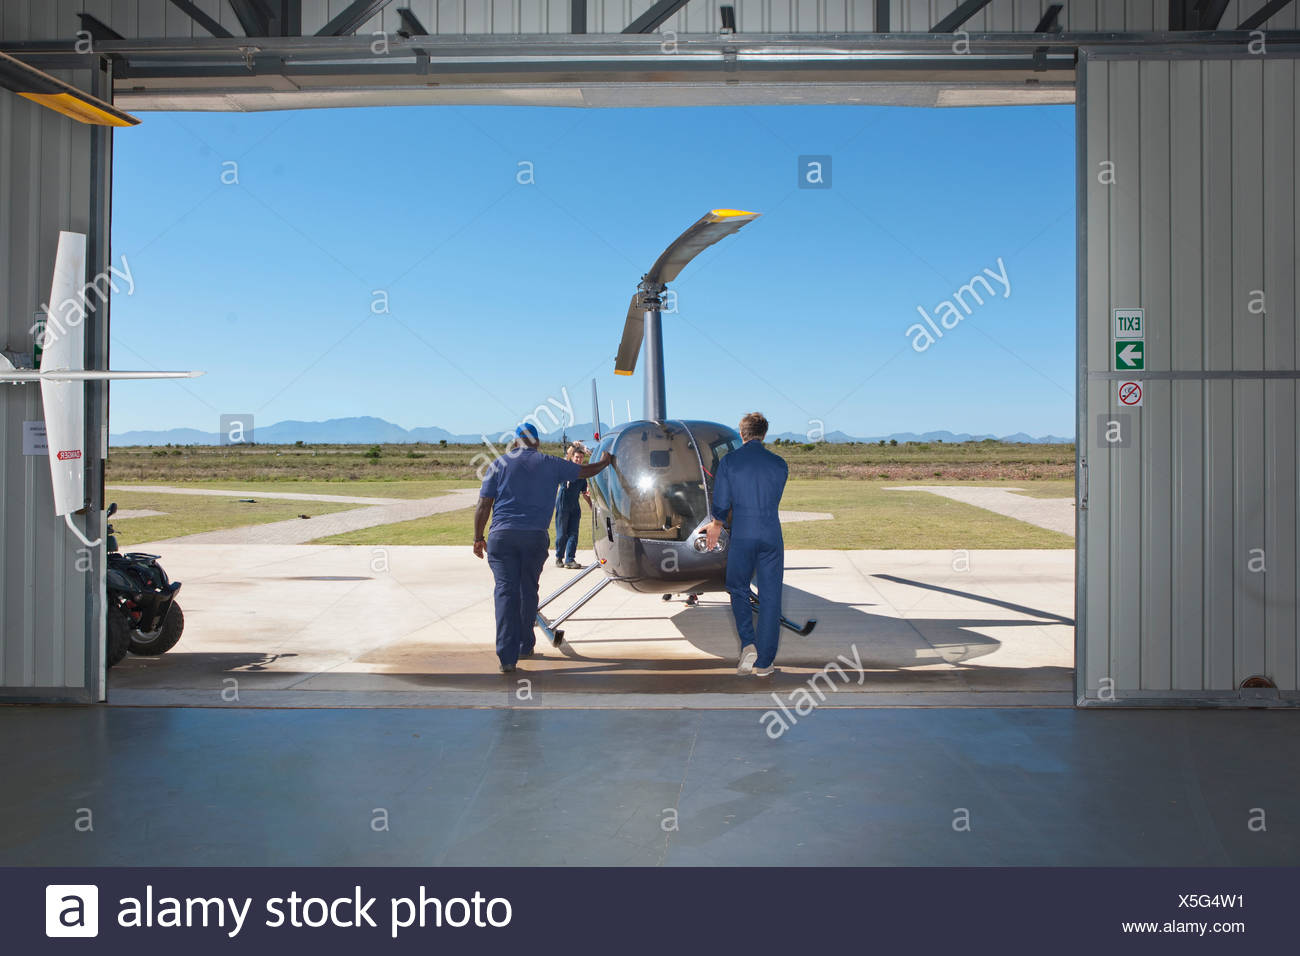 Pilots pushing helicopter onto tarmac - Stock Image